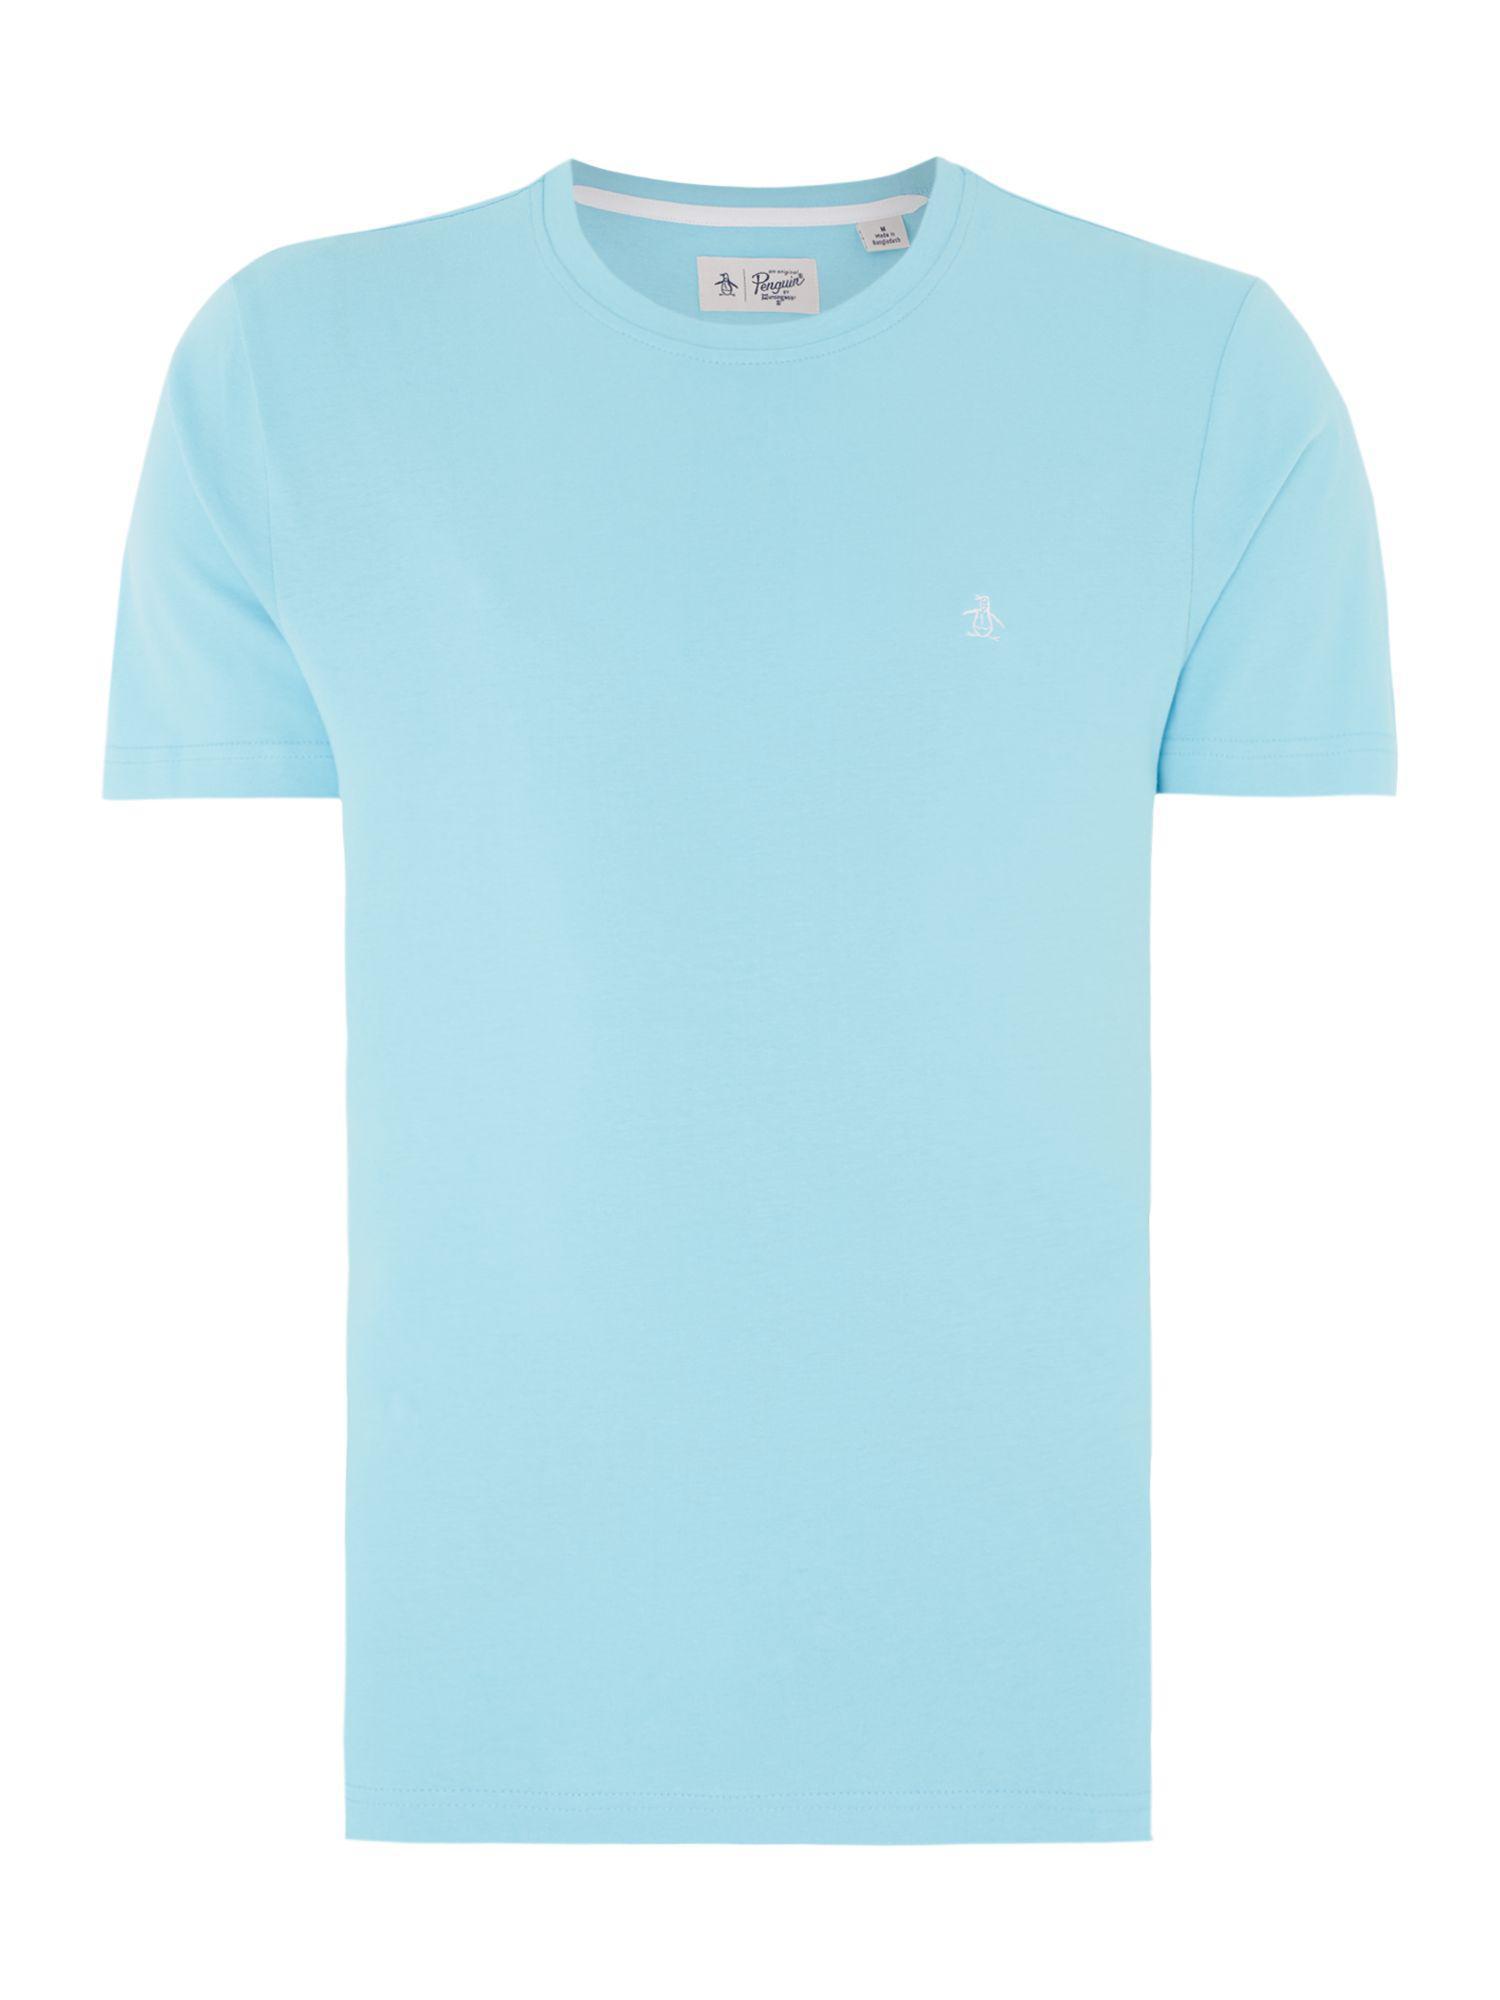 Mens Pinpoint Tee T-Shirt Original Penguin Choice Sale Online Cheap Low Shipping KTGd2rVg